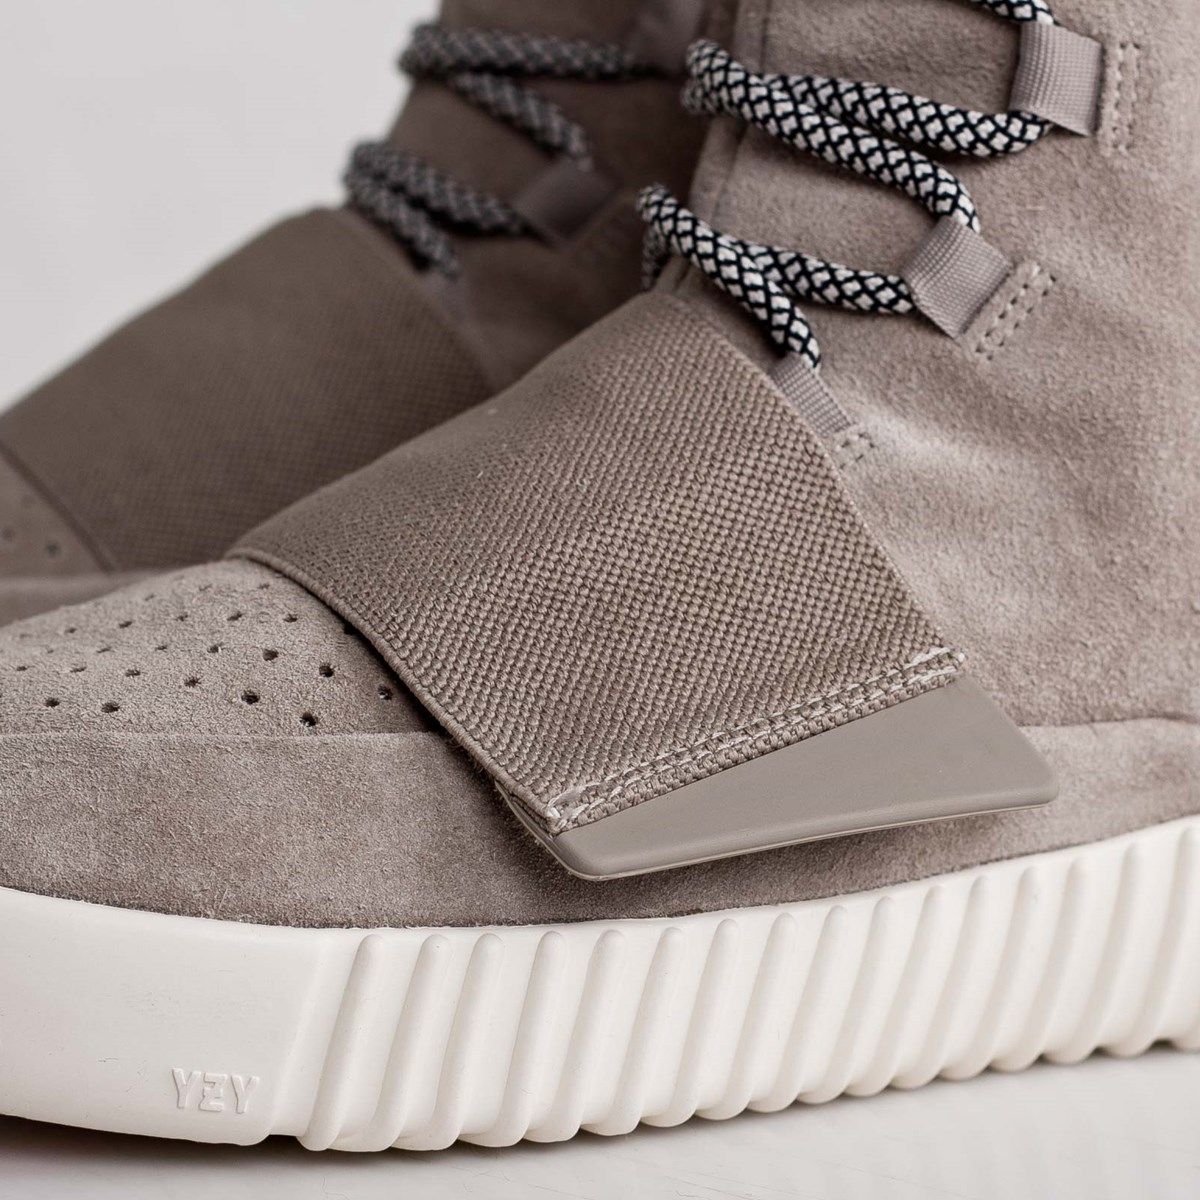 bdff685173b53 adidas Yeezy 750 Boost - B35309 - Sneakersnstuff